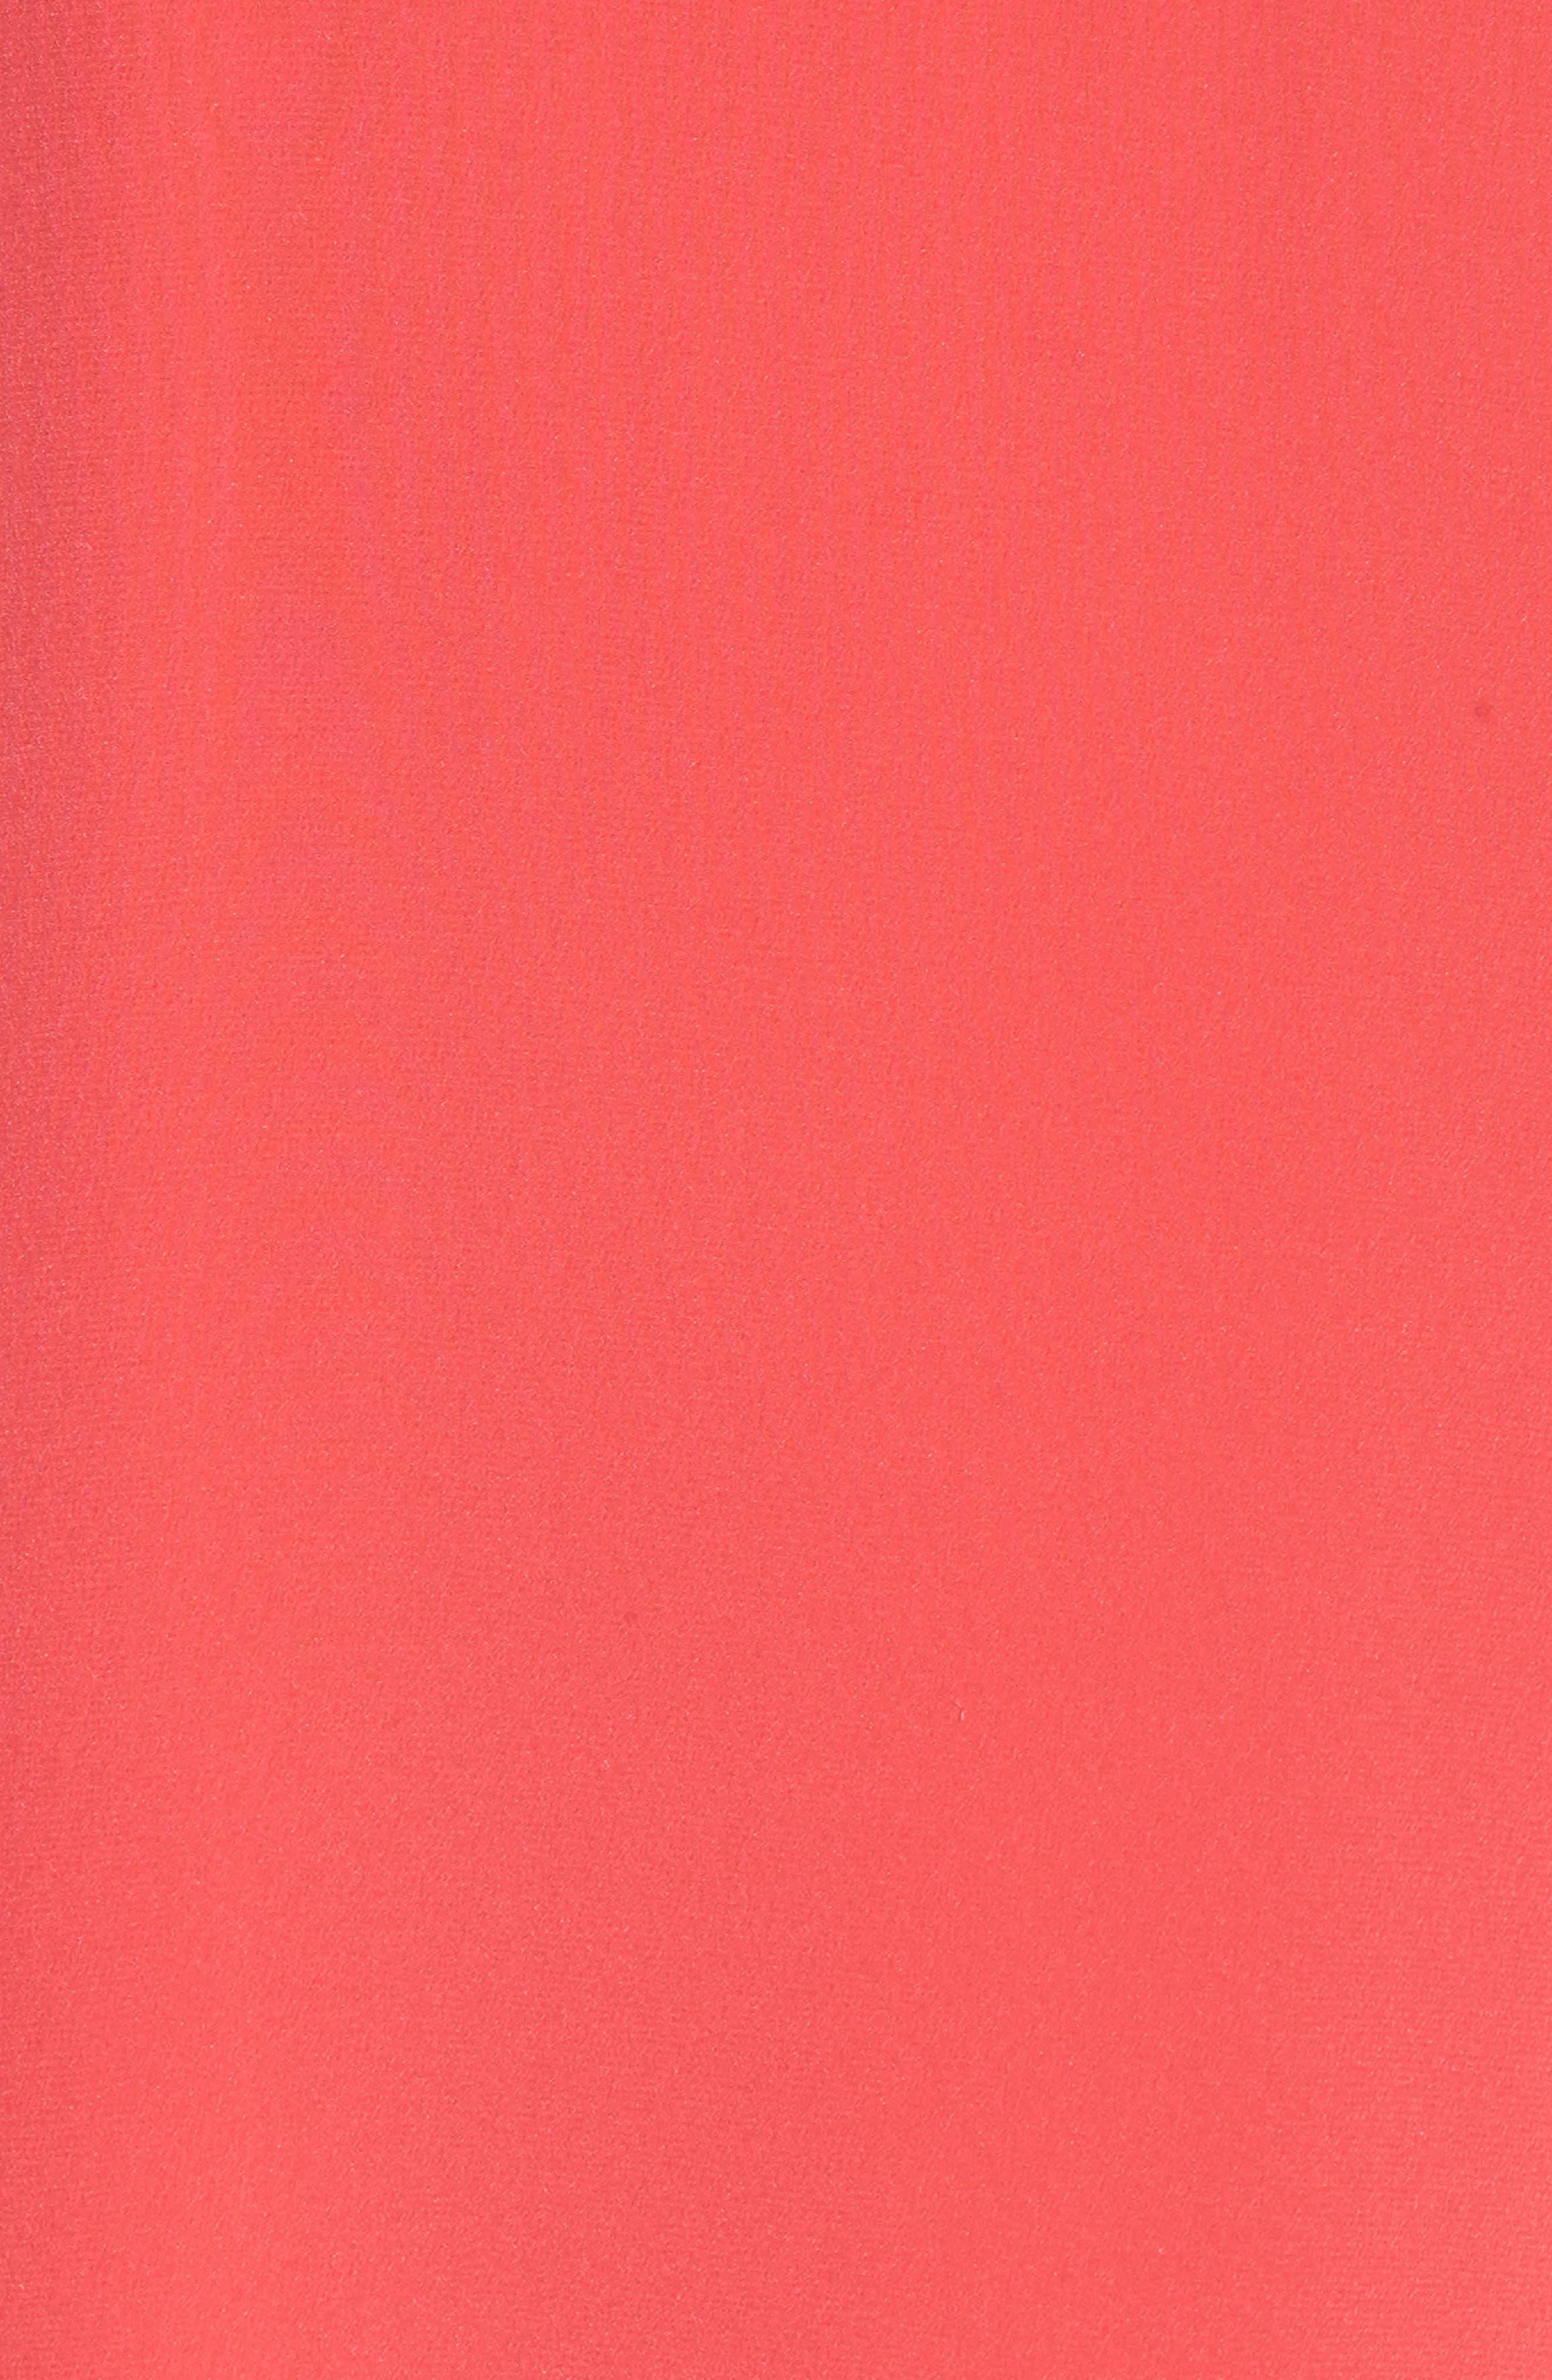 Ruffle Silk Maxi Dress,                             Alternate thumbnail 5, color,                             620